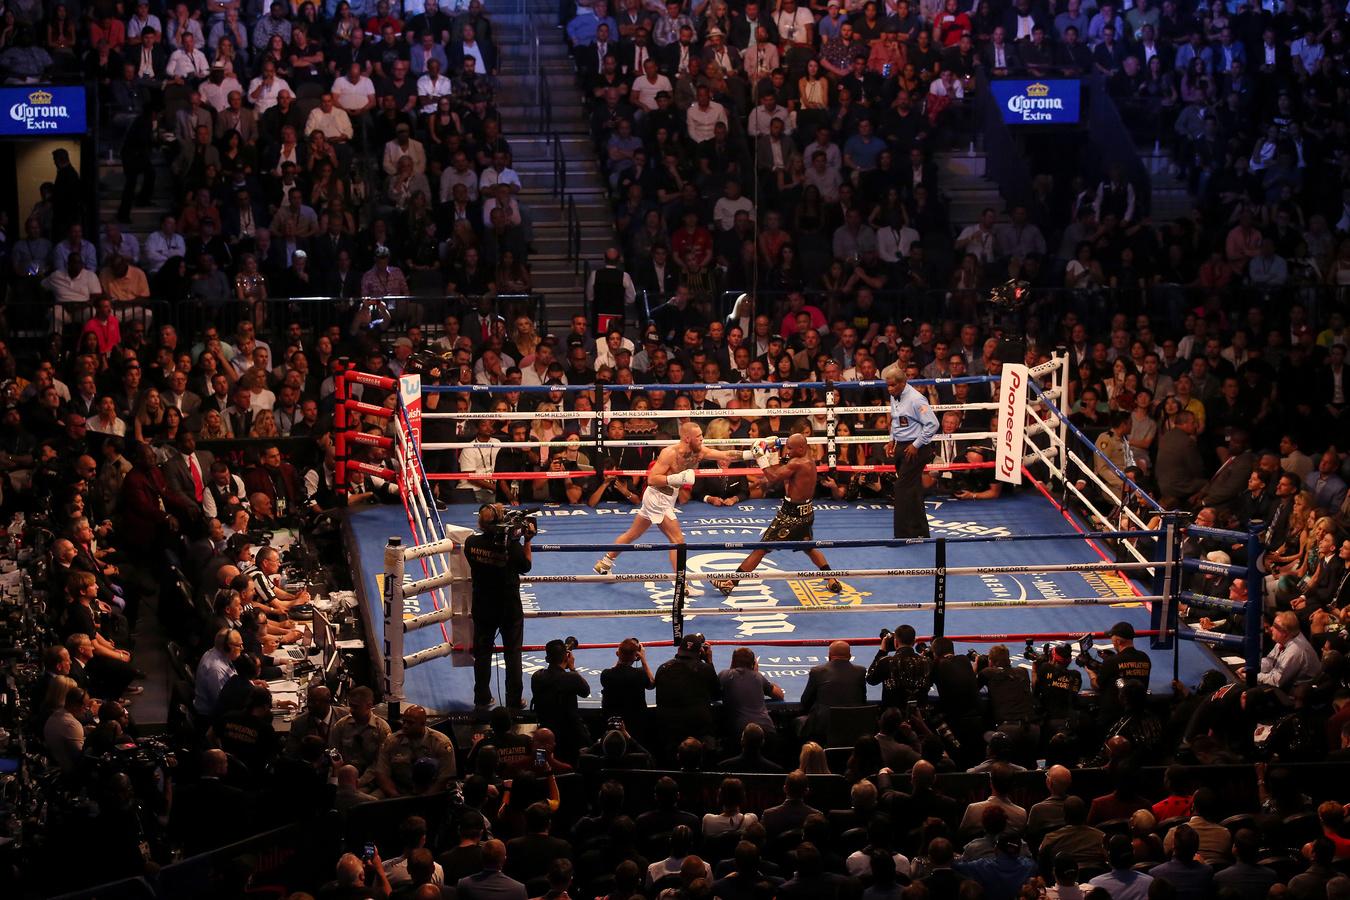 BRIDGET BENNETT Las Vegas, NV, USA  www.bridgetkb.com   @bridgetkbennett  //  @bridgetkbennett